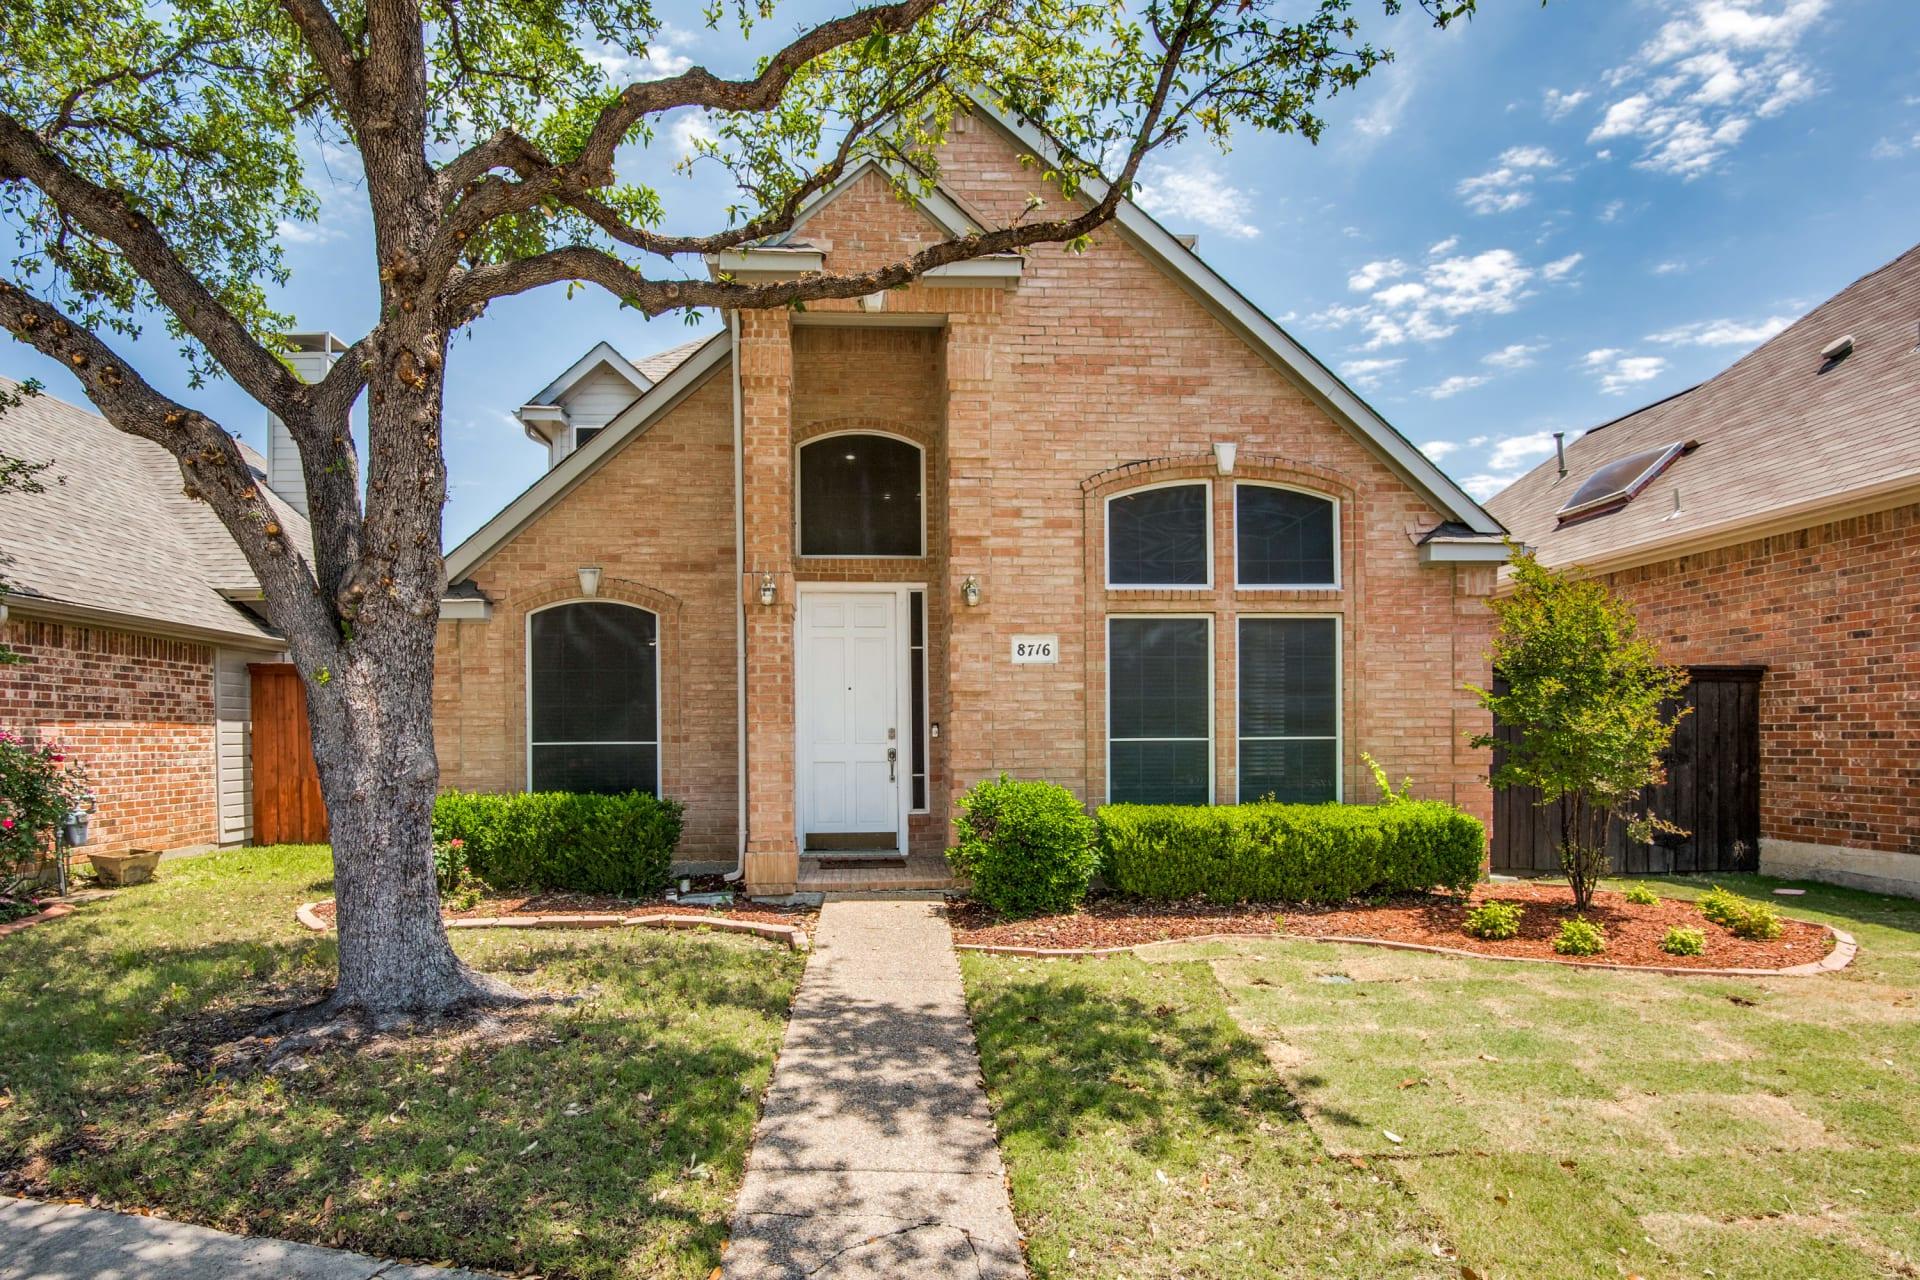 8716 Falls Rd. Irving Texas photo